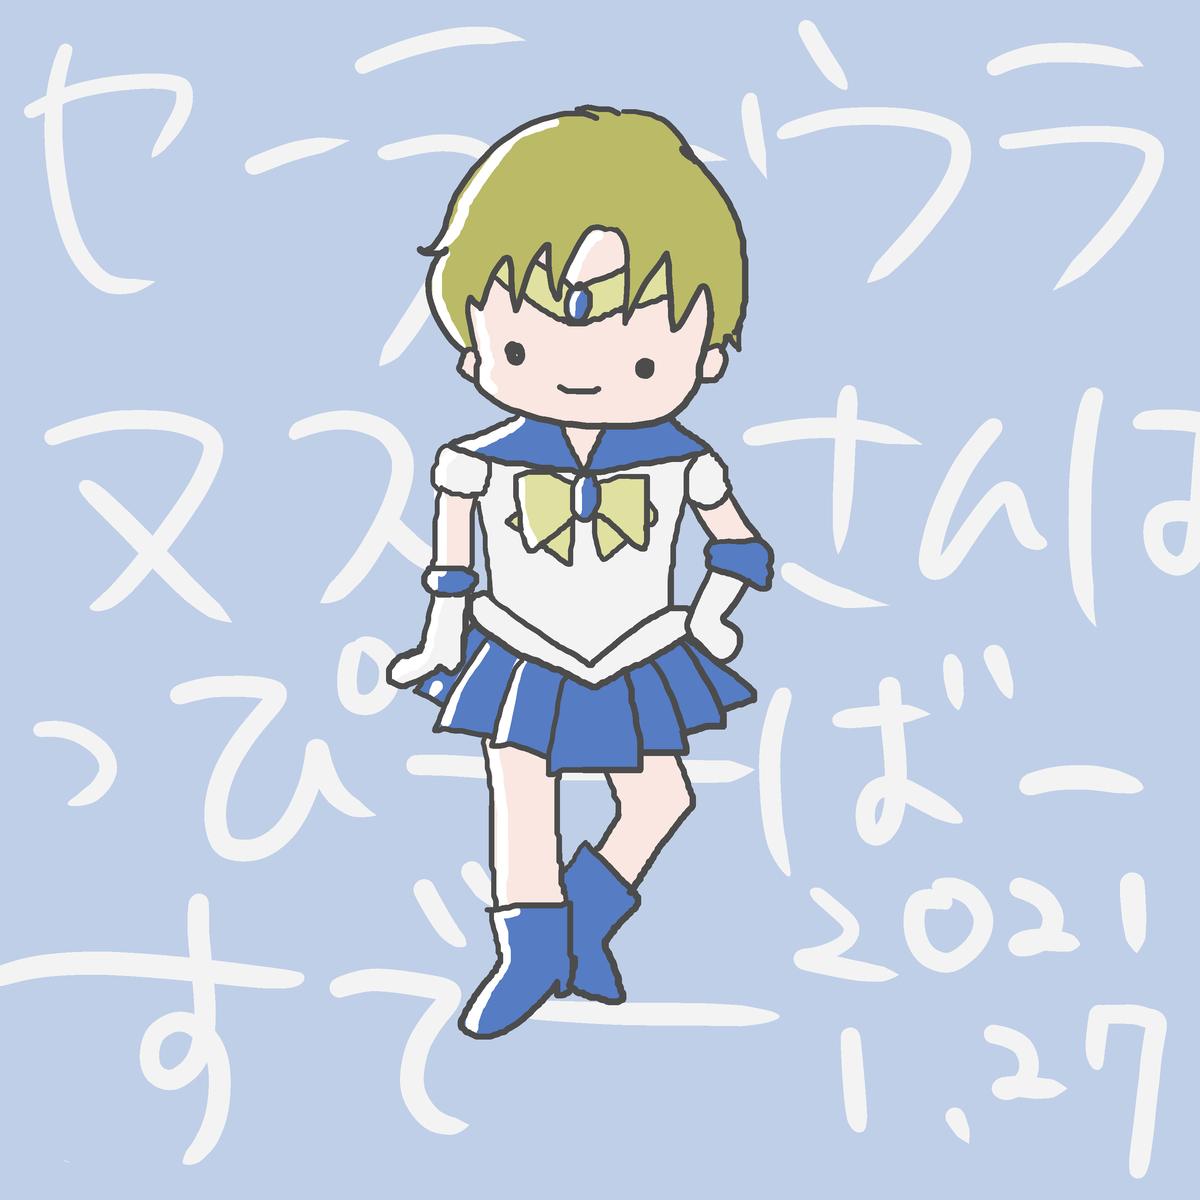 f:id:ika_yoshi:20210130061200j:plain